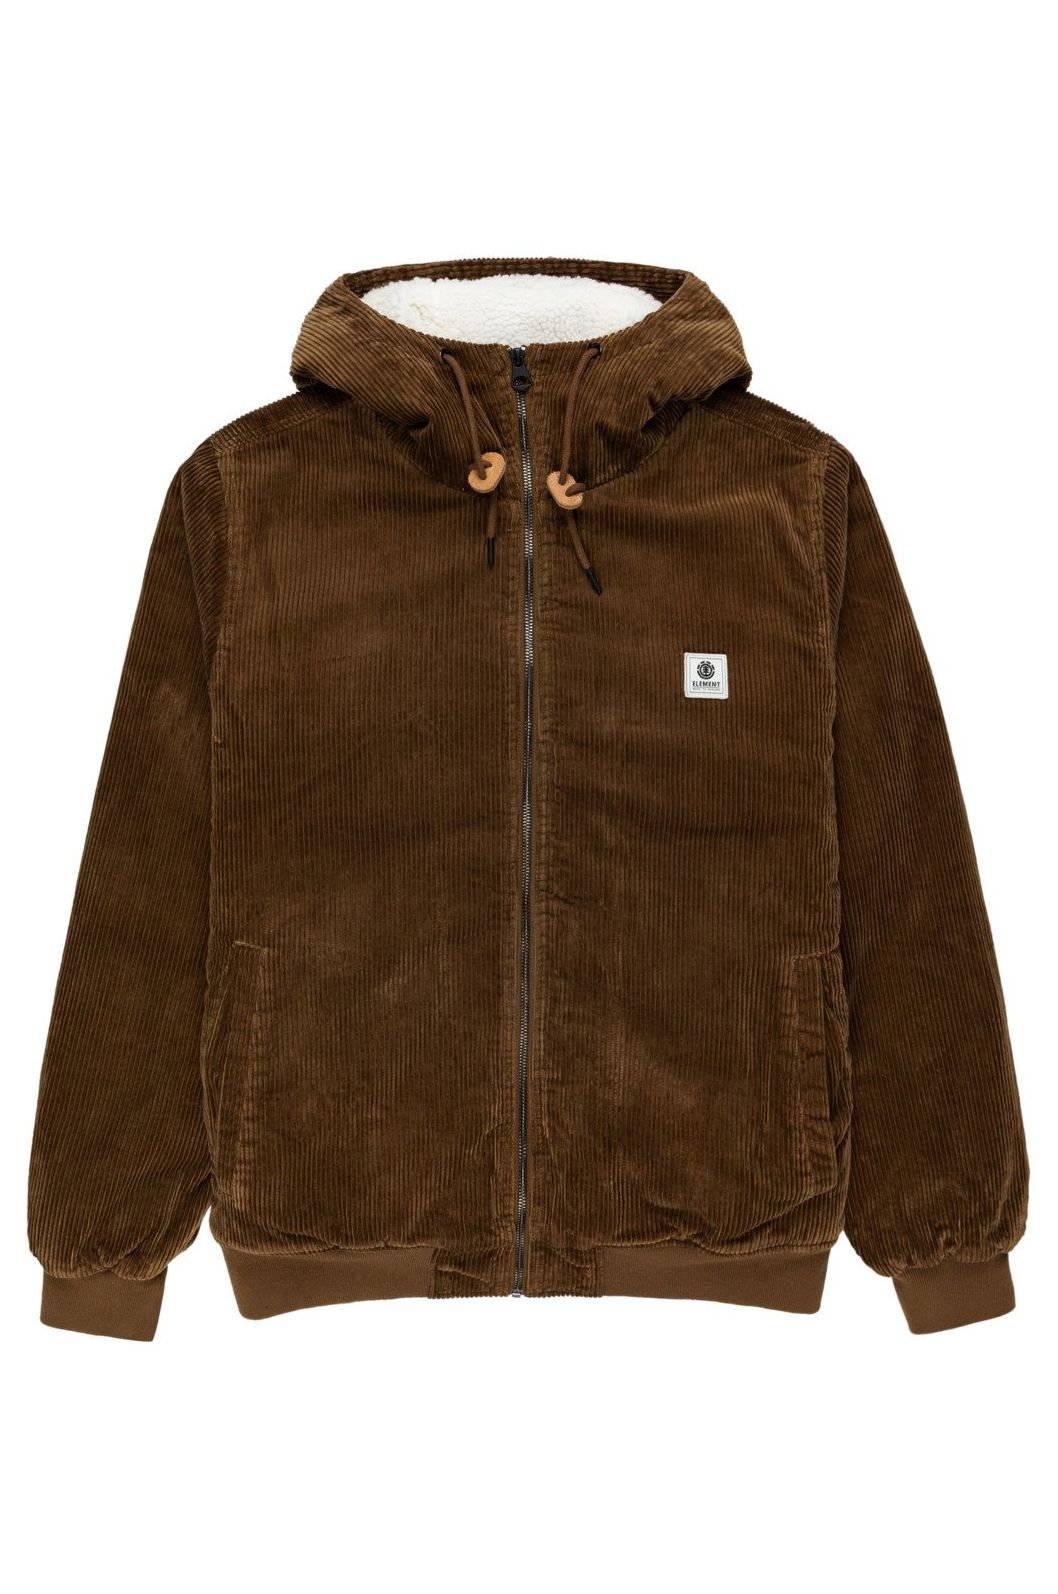 Element Jacket DULCEY CORDUROY WOLFEBORO Teak